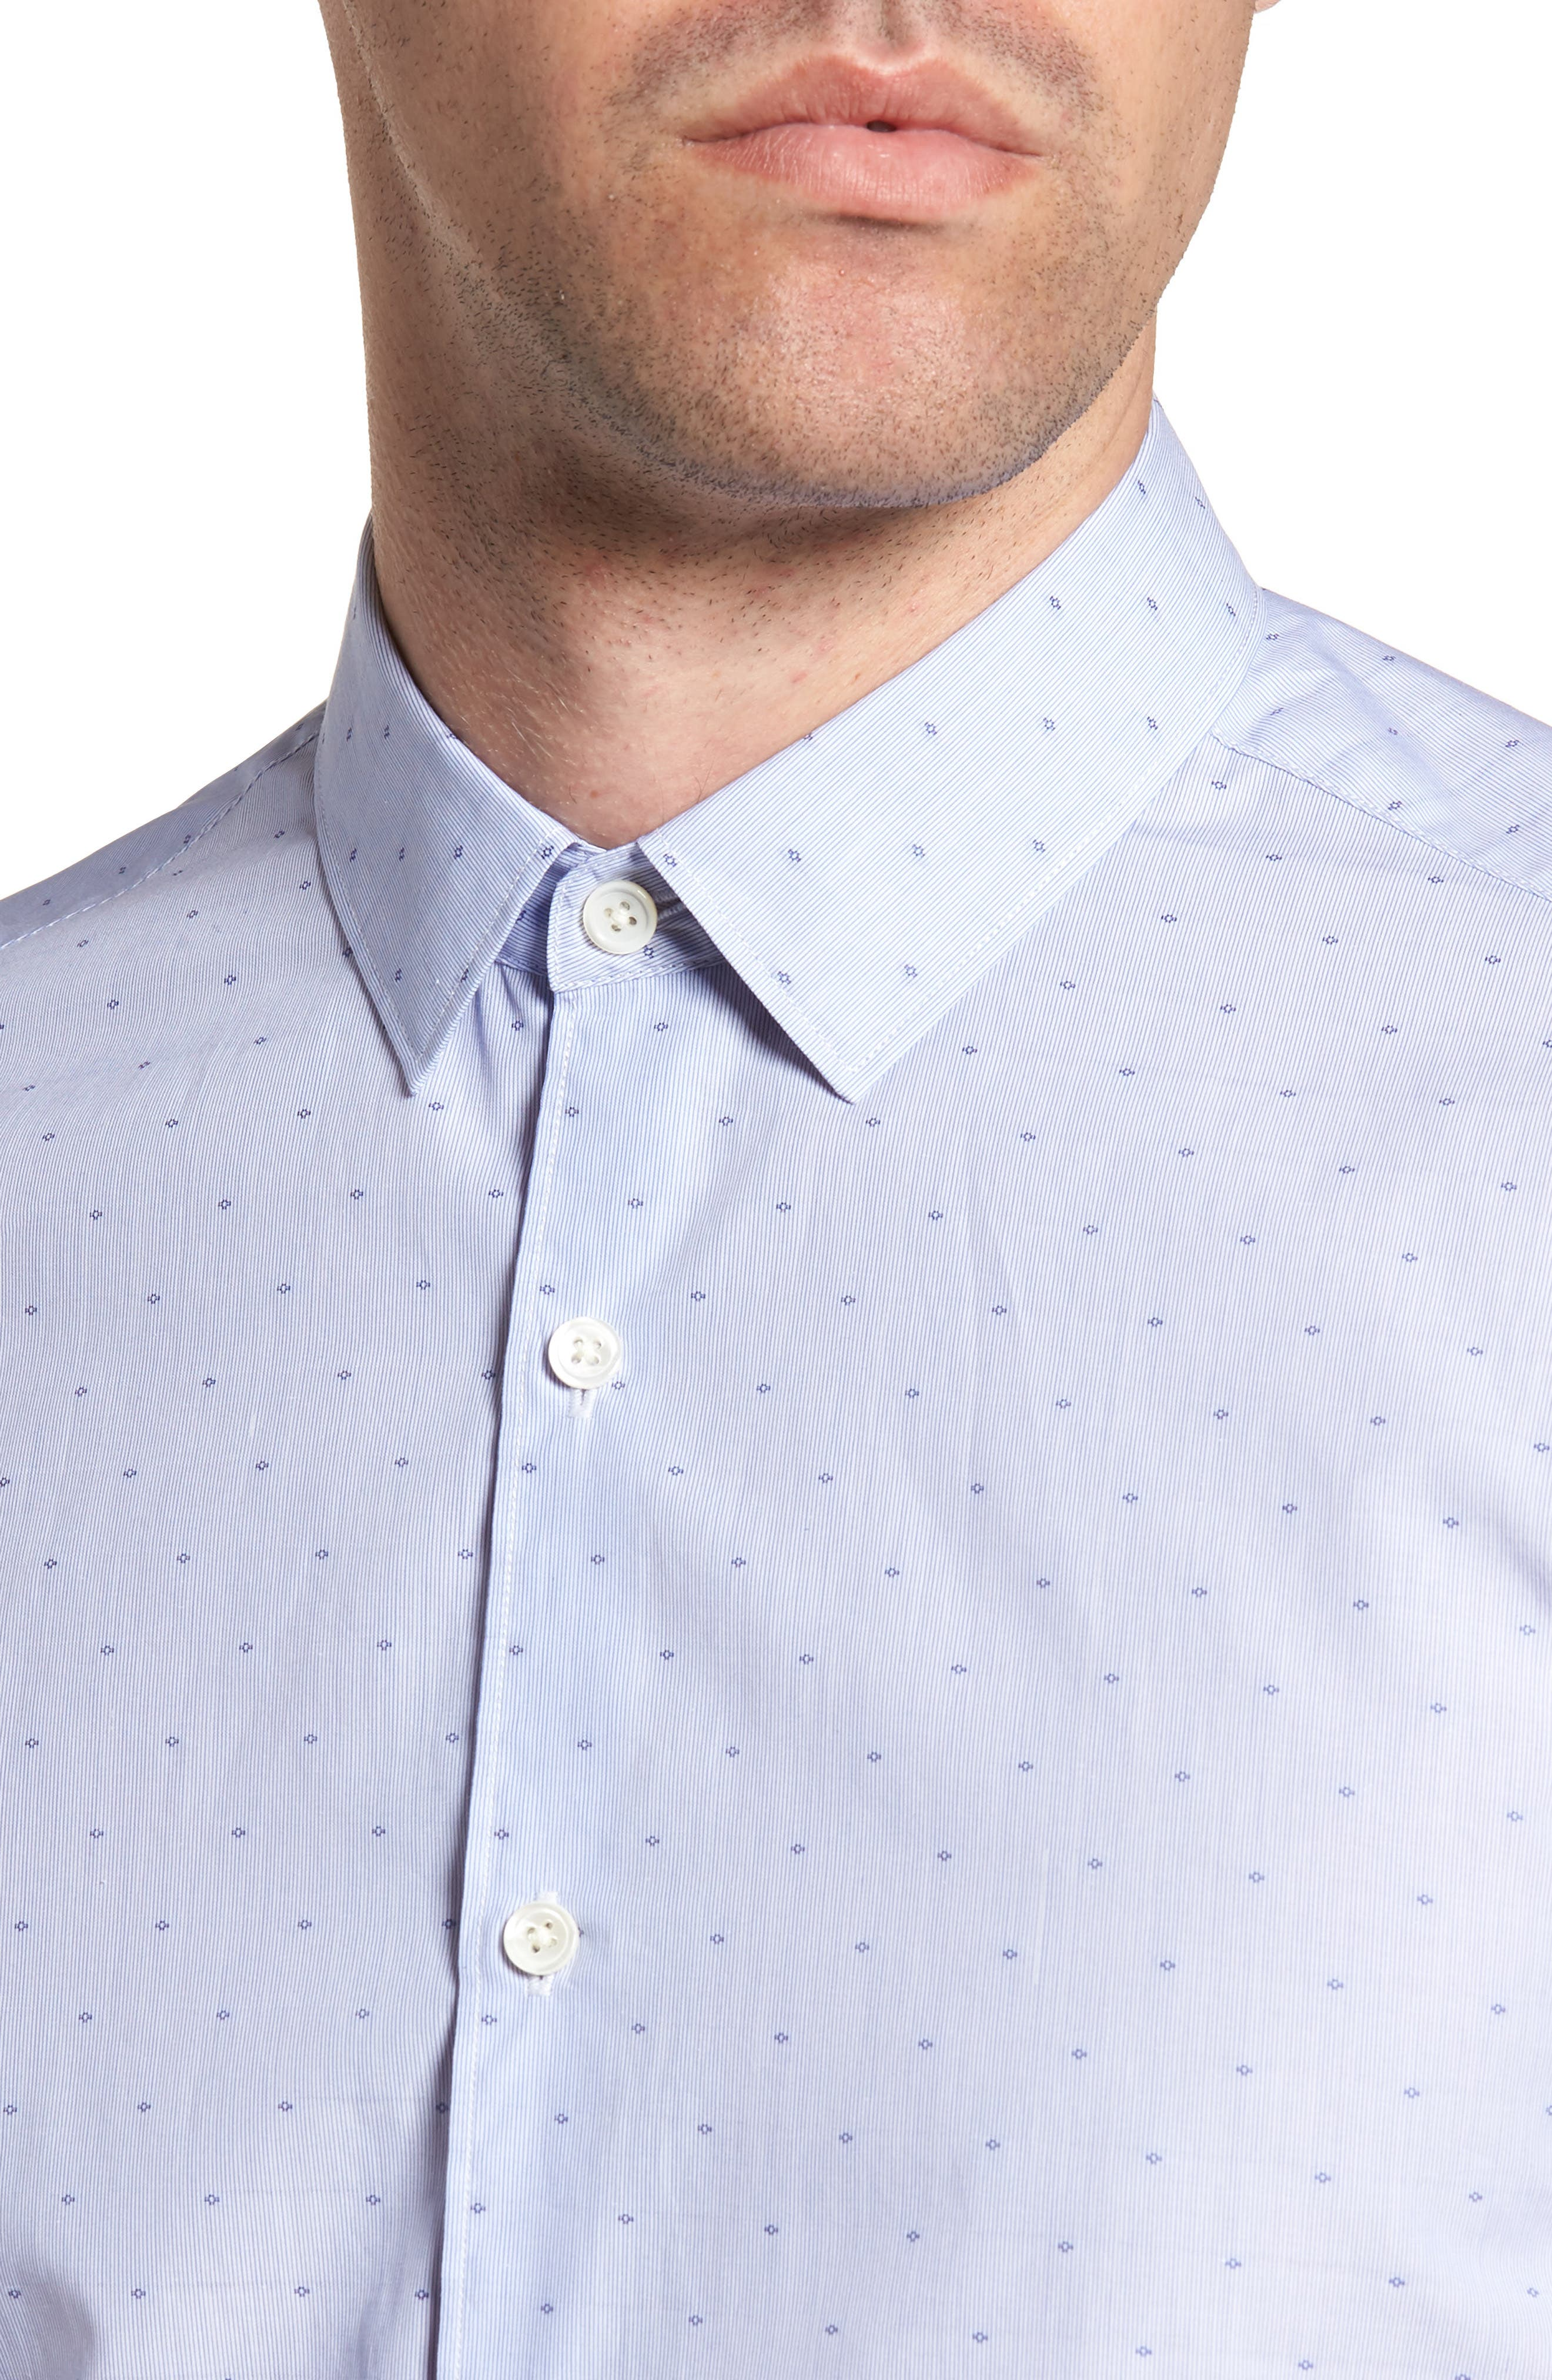 Murrary Coupe Trim Fit Sport Shirt,                             Alternate thumbnail 4, color,                             Finch